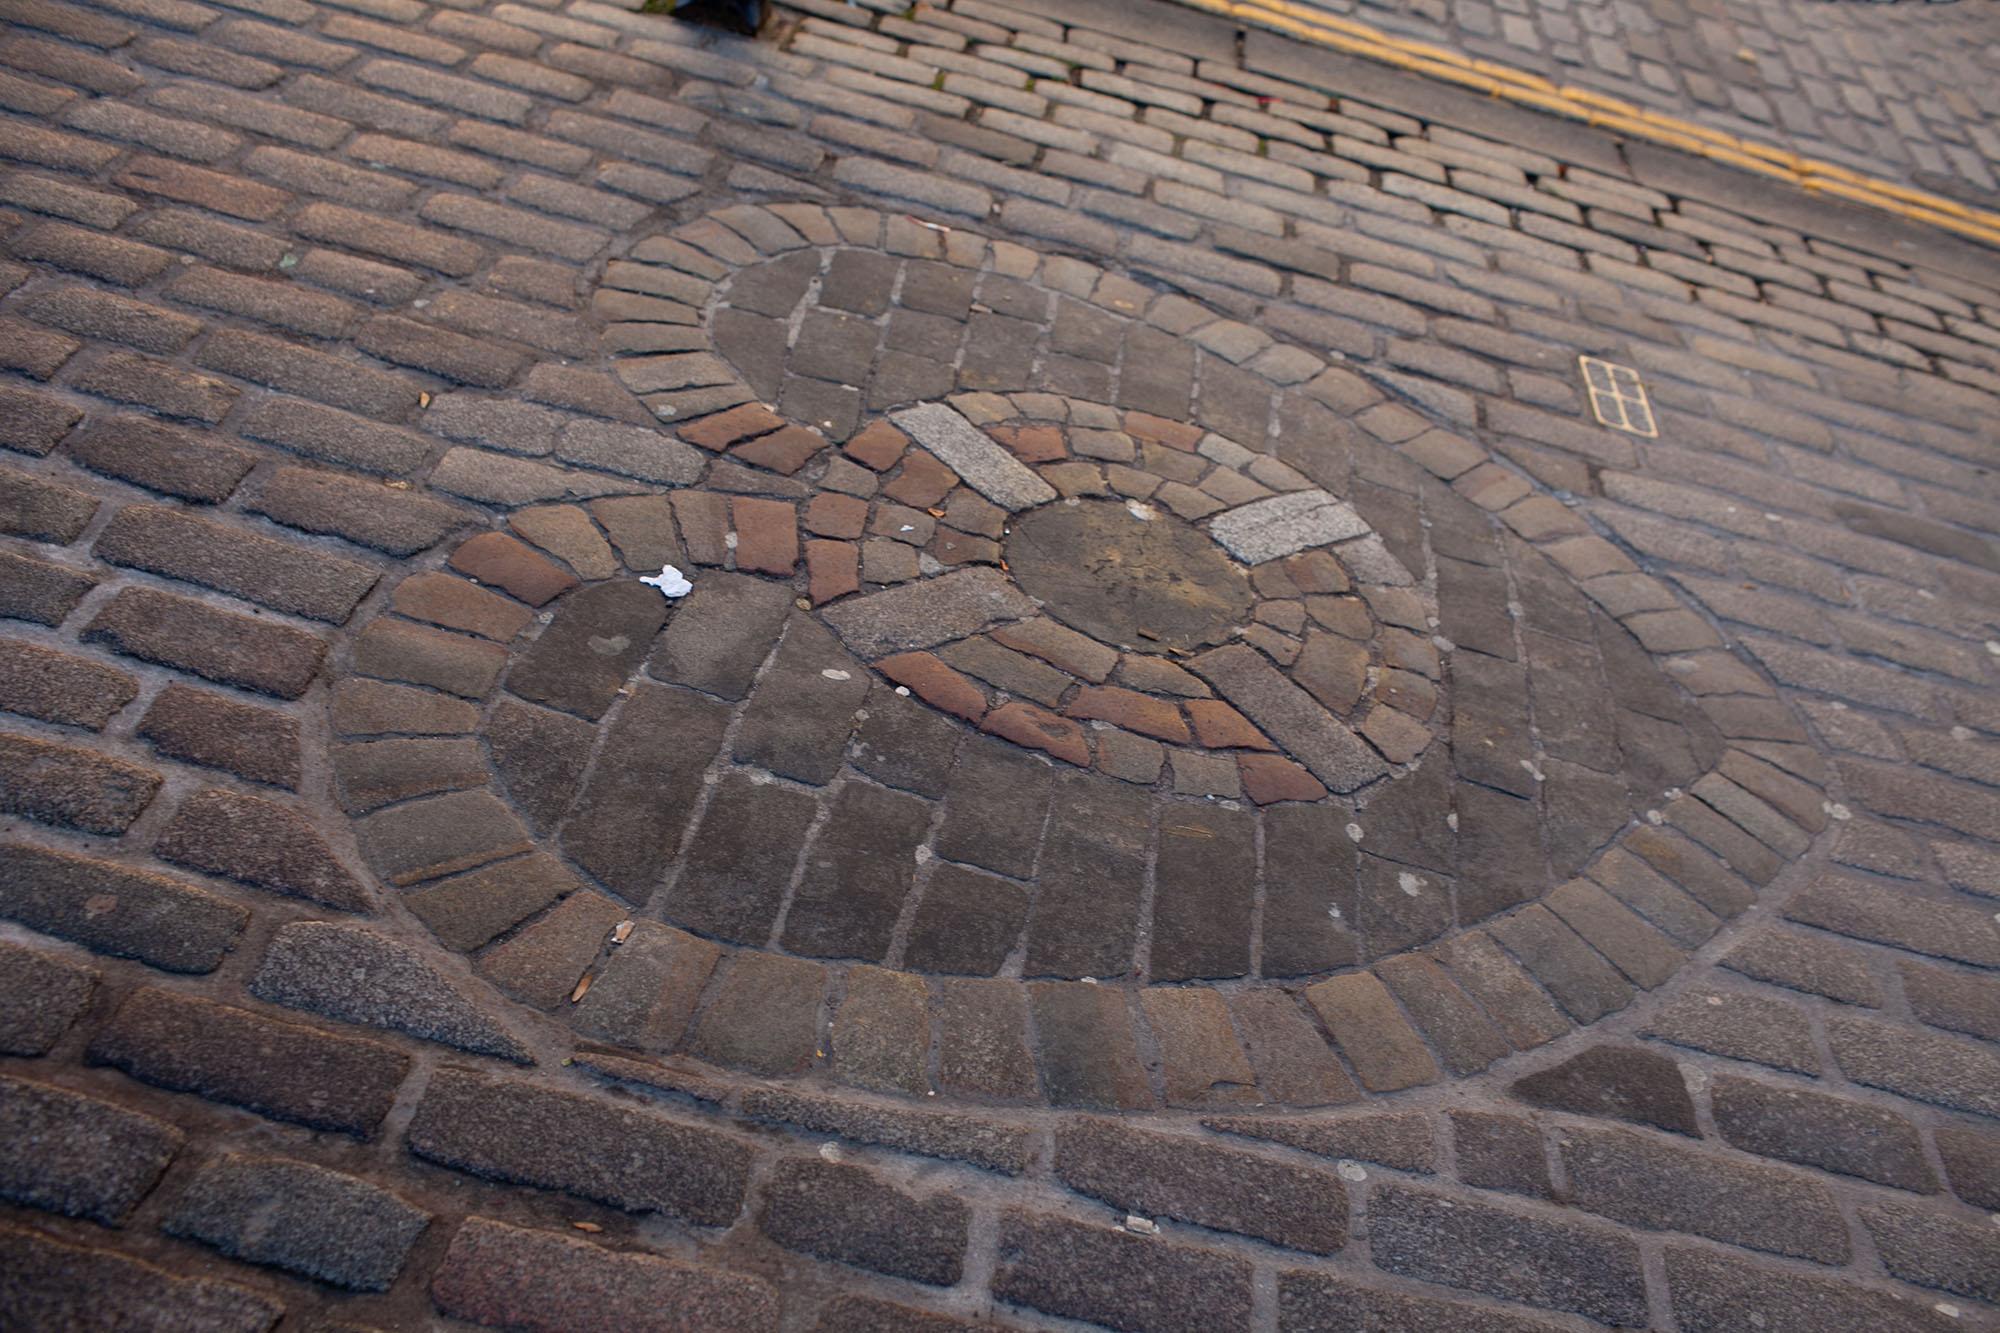 Heart of Midlothian in Edinburgh, Scotland